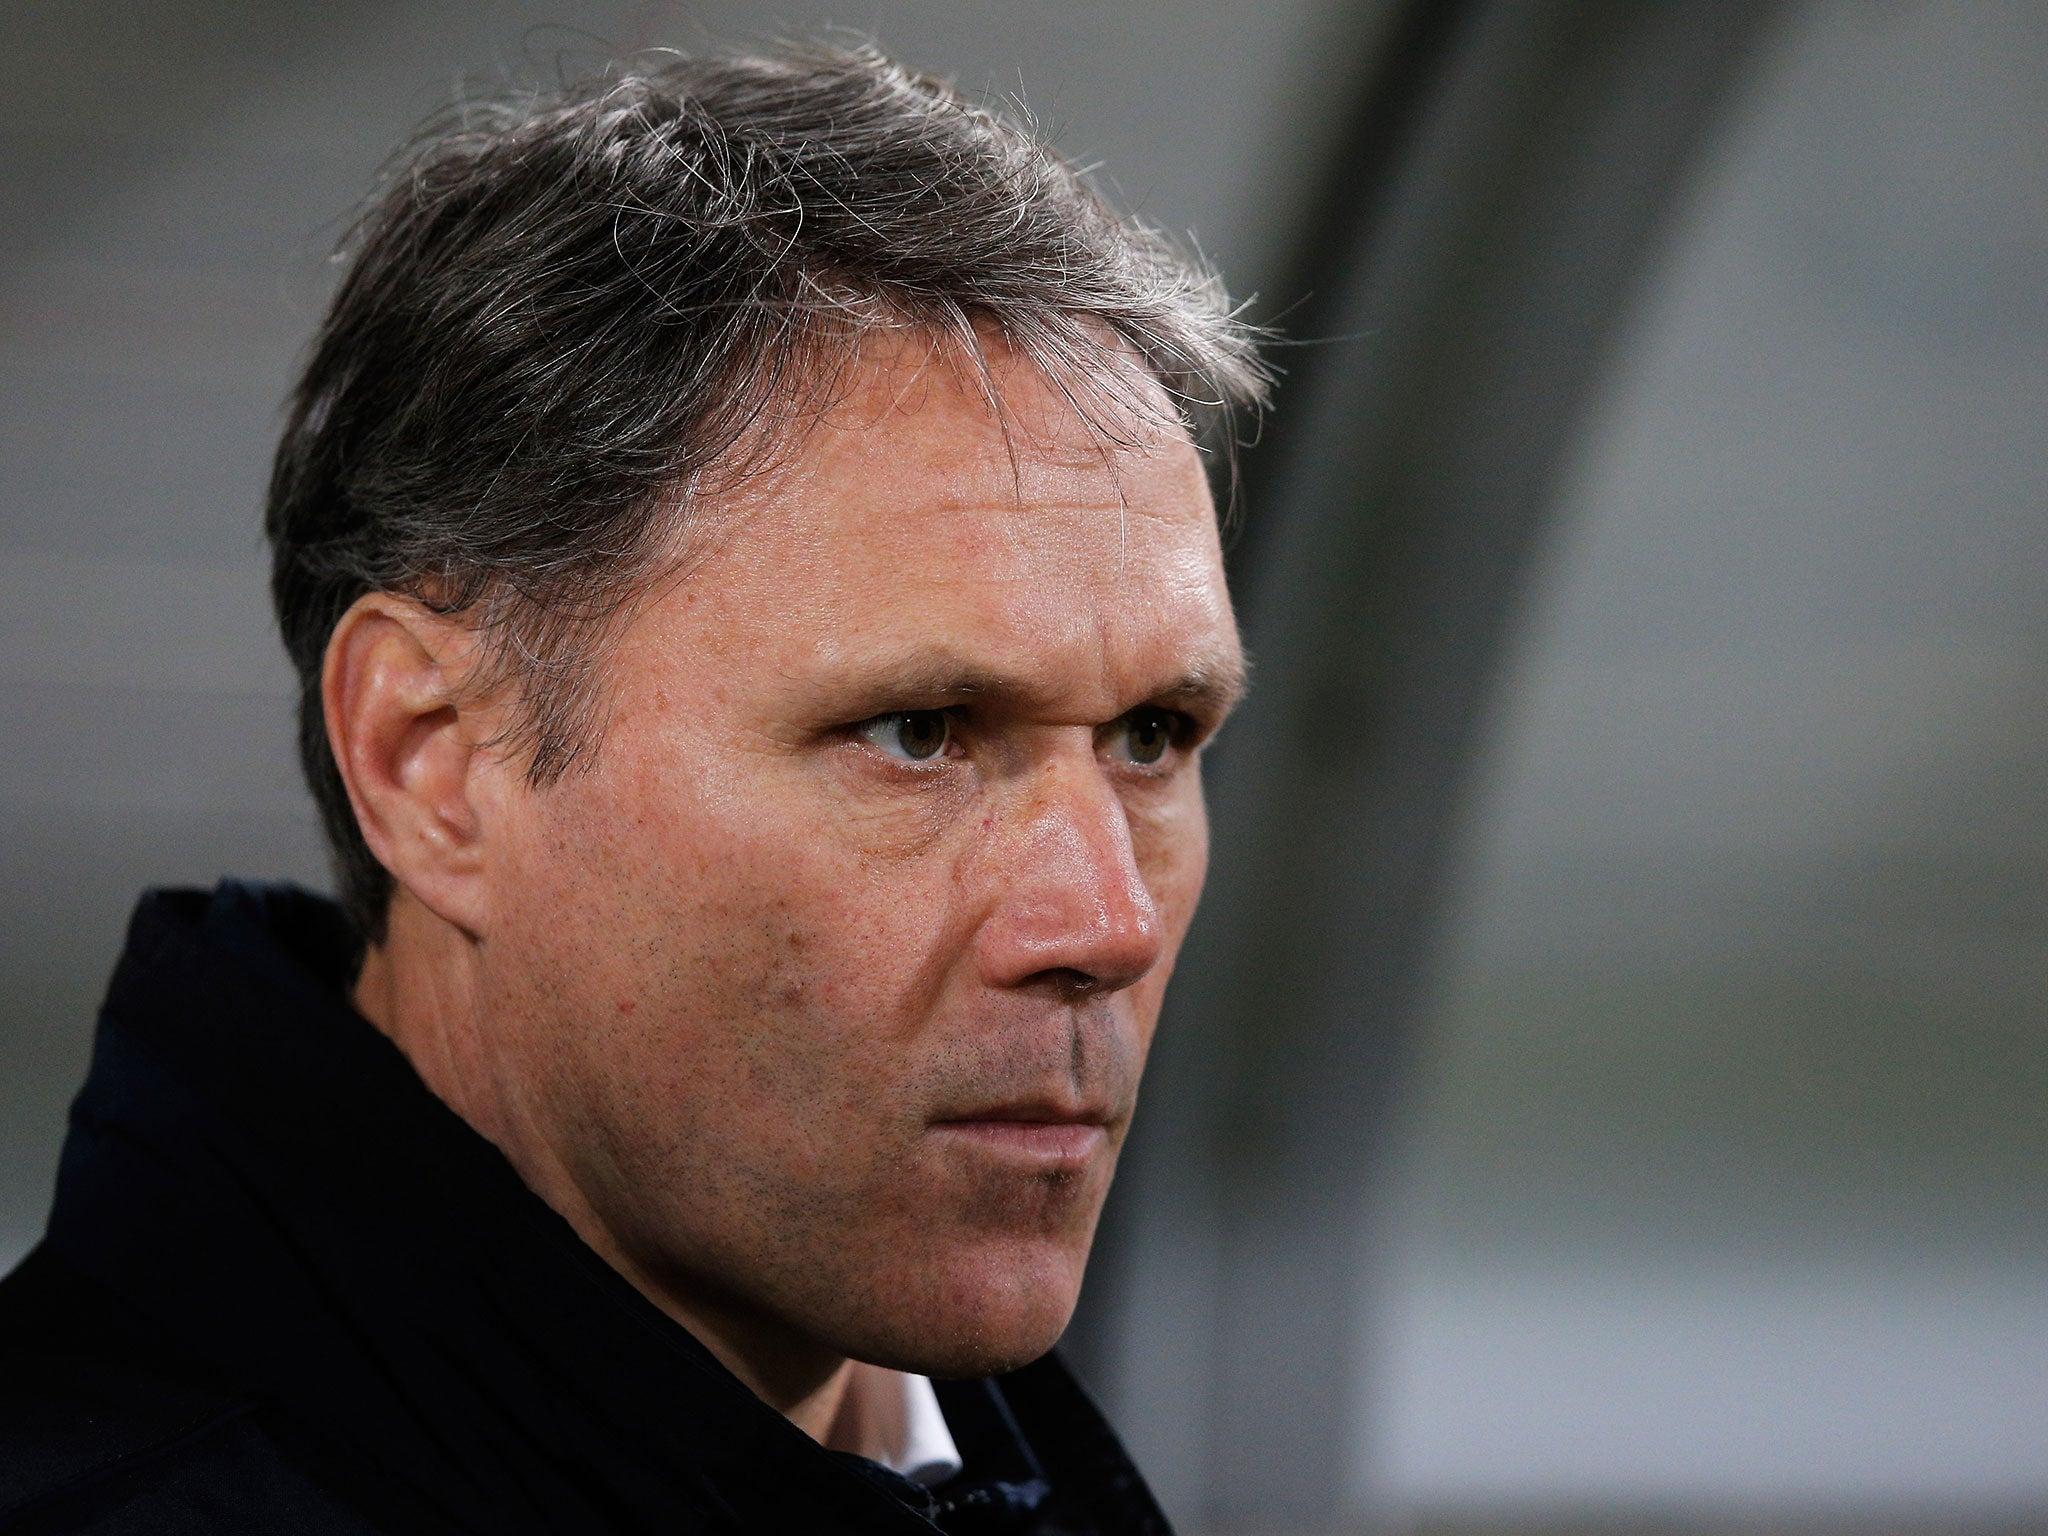 Marco van Basten to step down as AZ Alkmaar coach due to